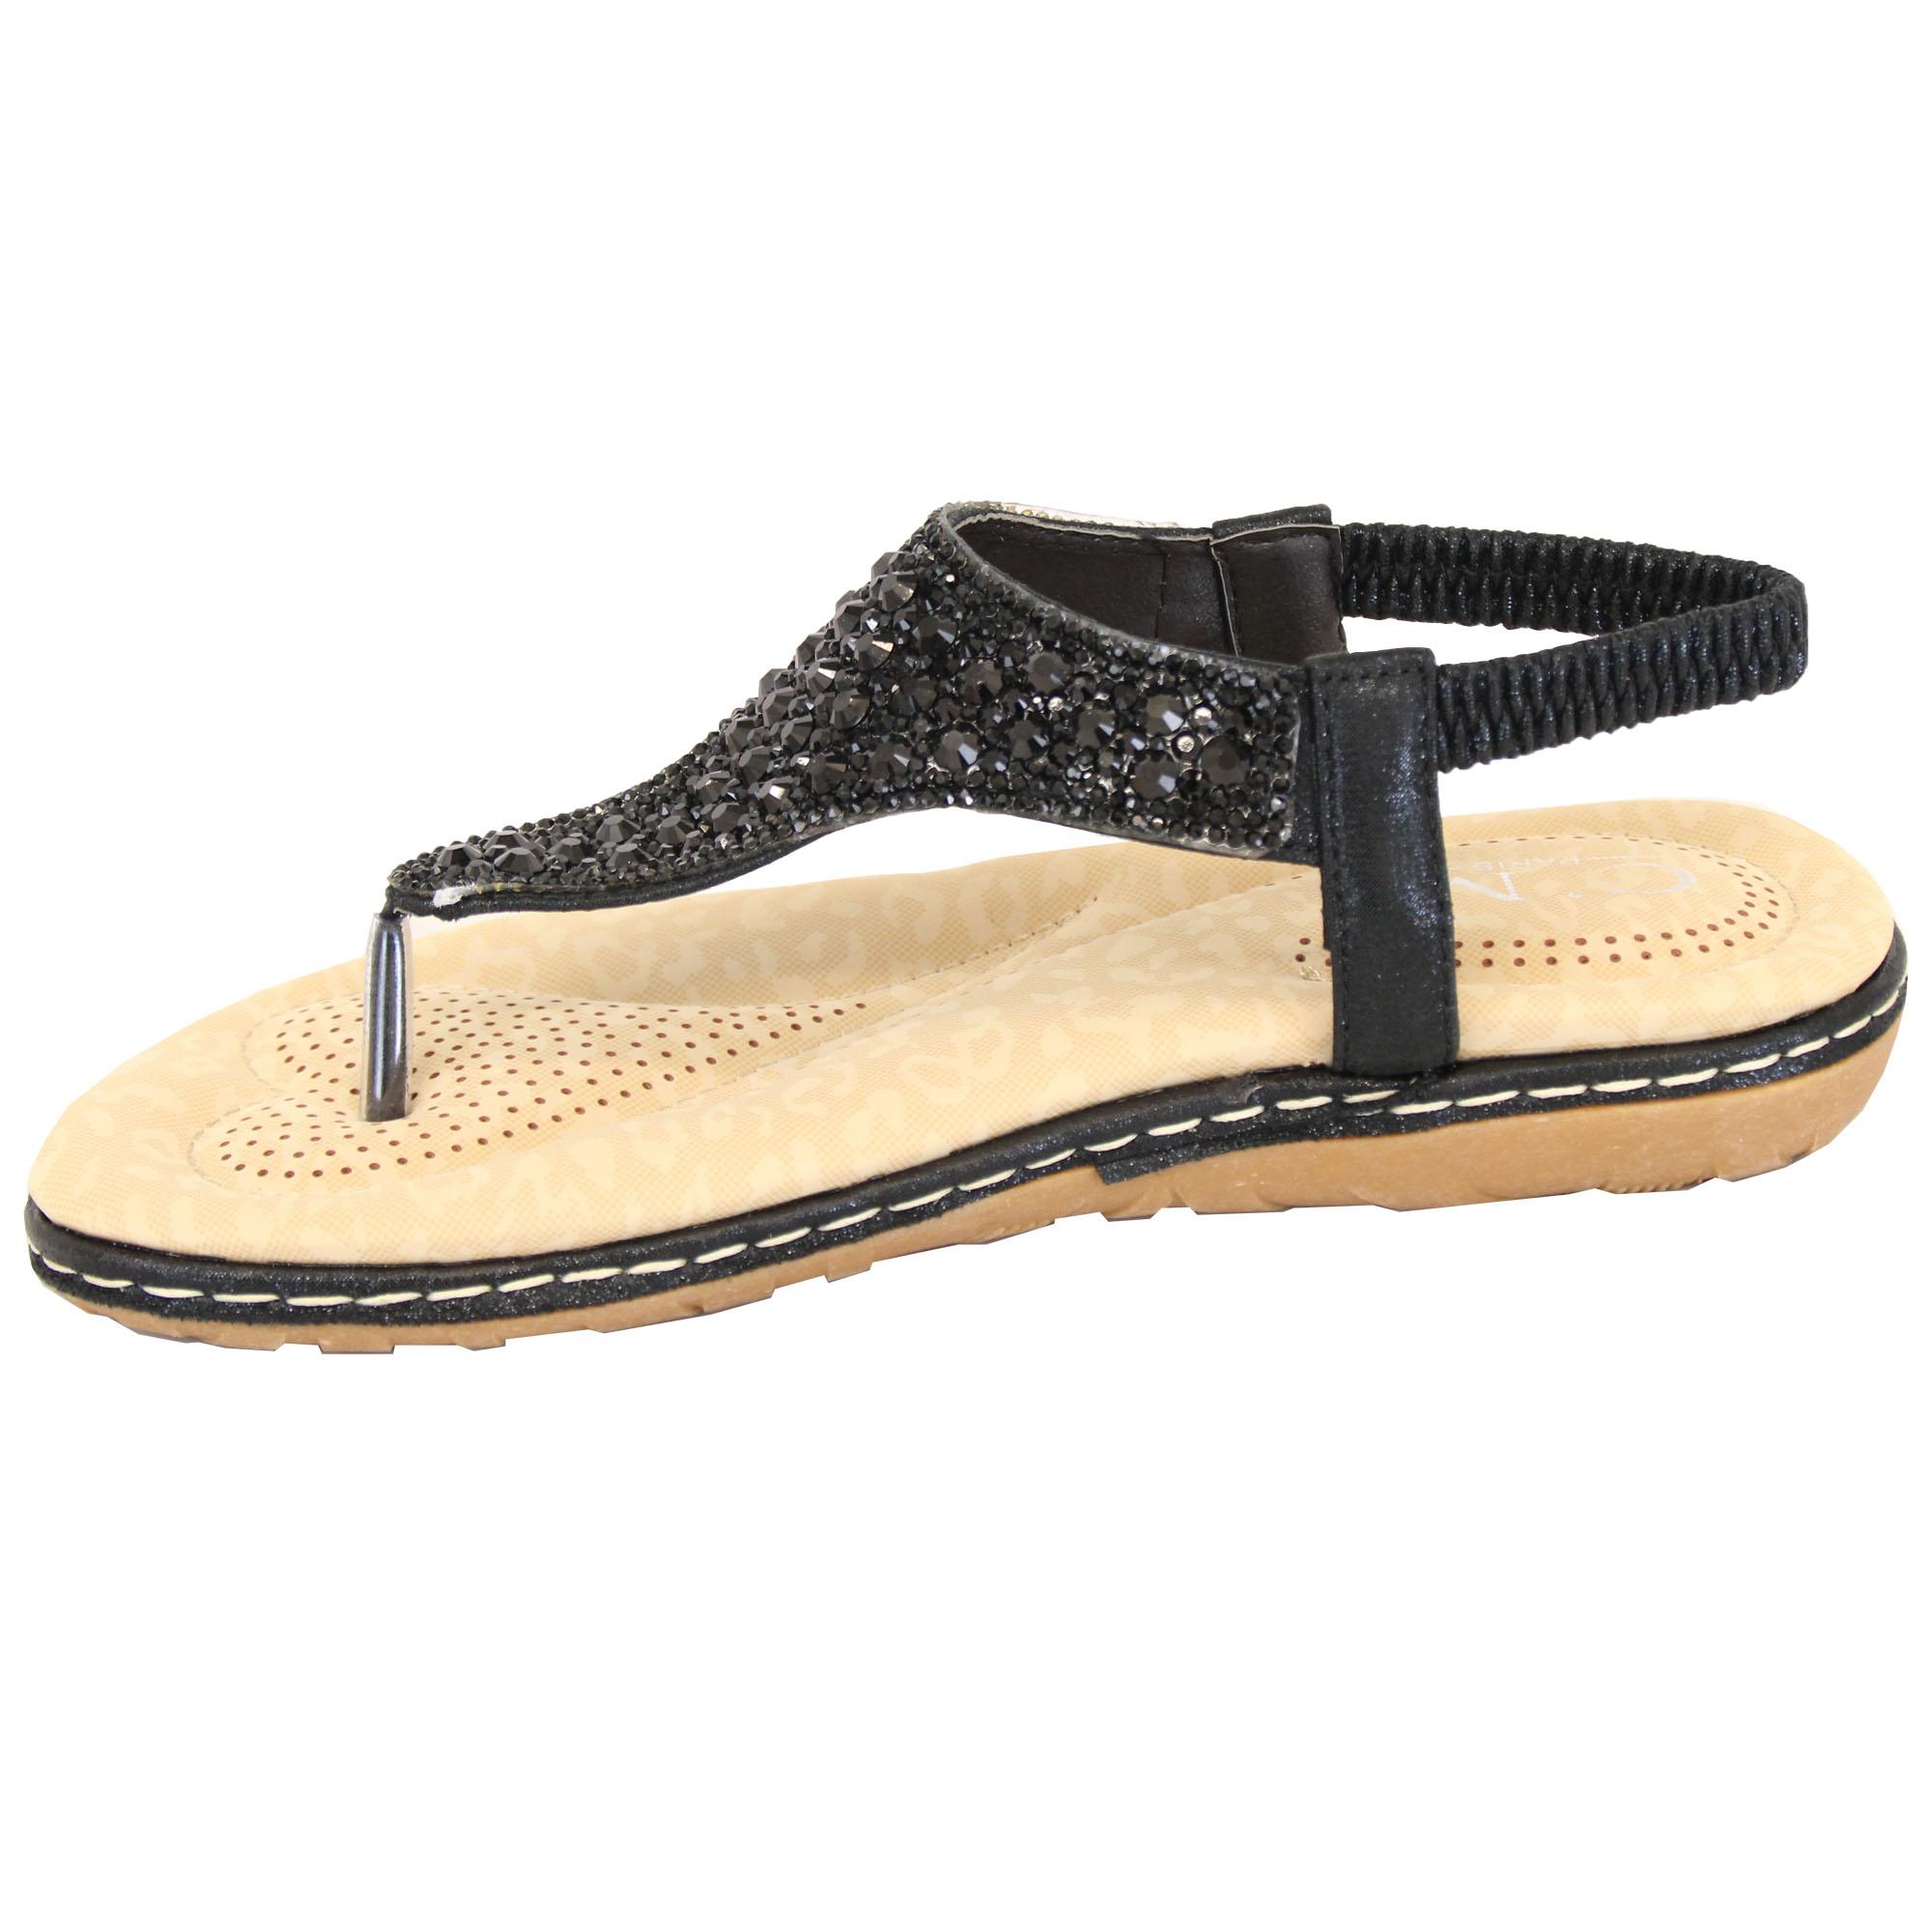 Ladies-Diamante-Sandals-Womens-Slip-On-Toe-Post-Sling-Back-Shoes-Wedding-Party thumbnail 3